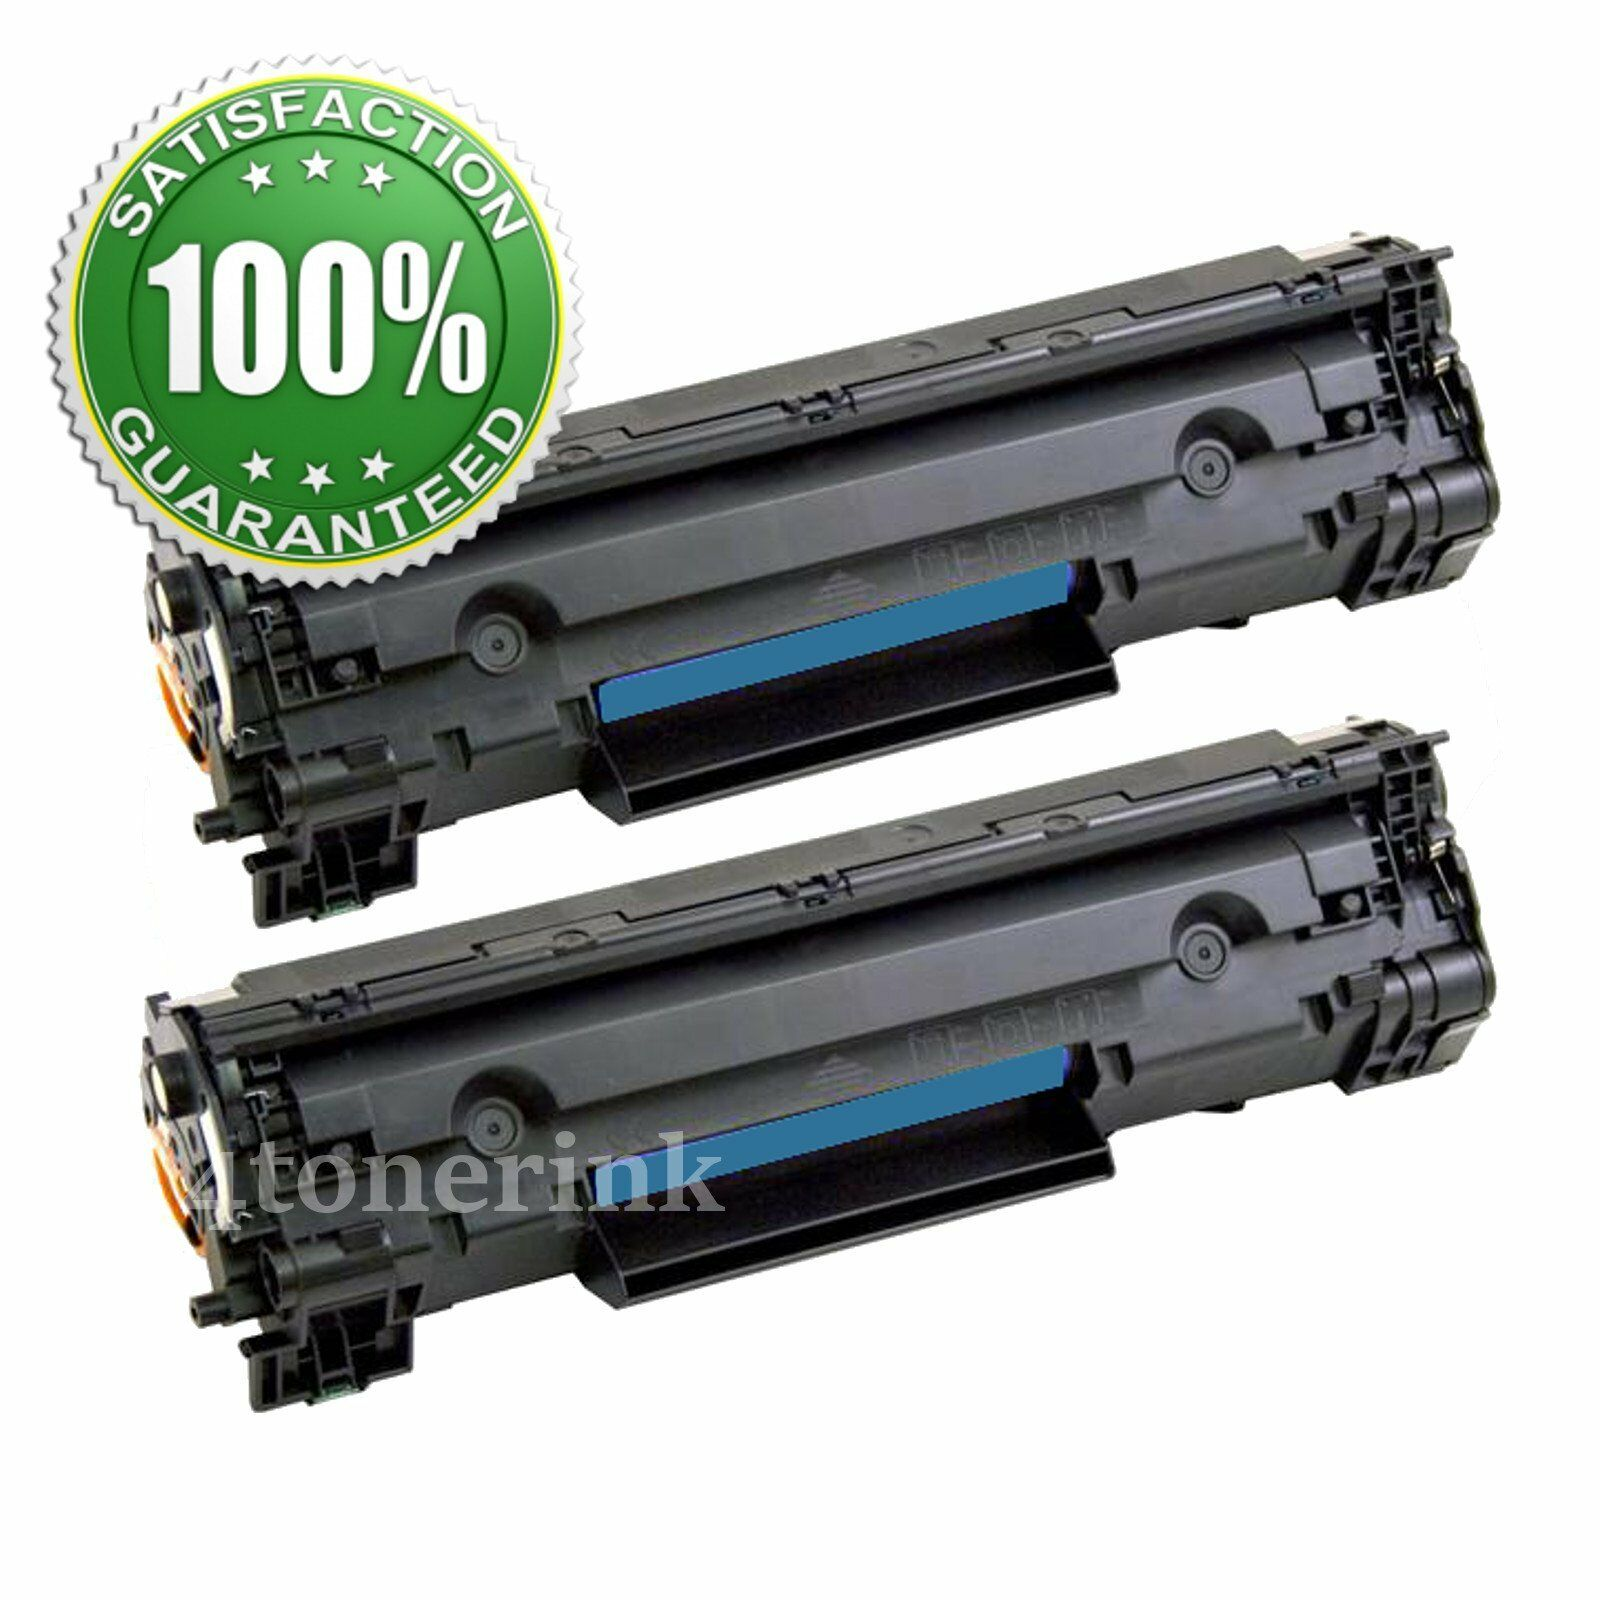 2pk Black Toner Cartridge For Canon 128 ImageClass D530 D550